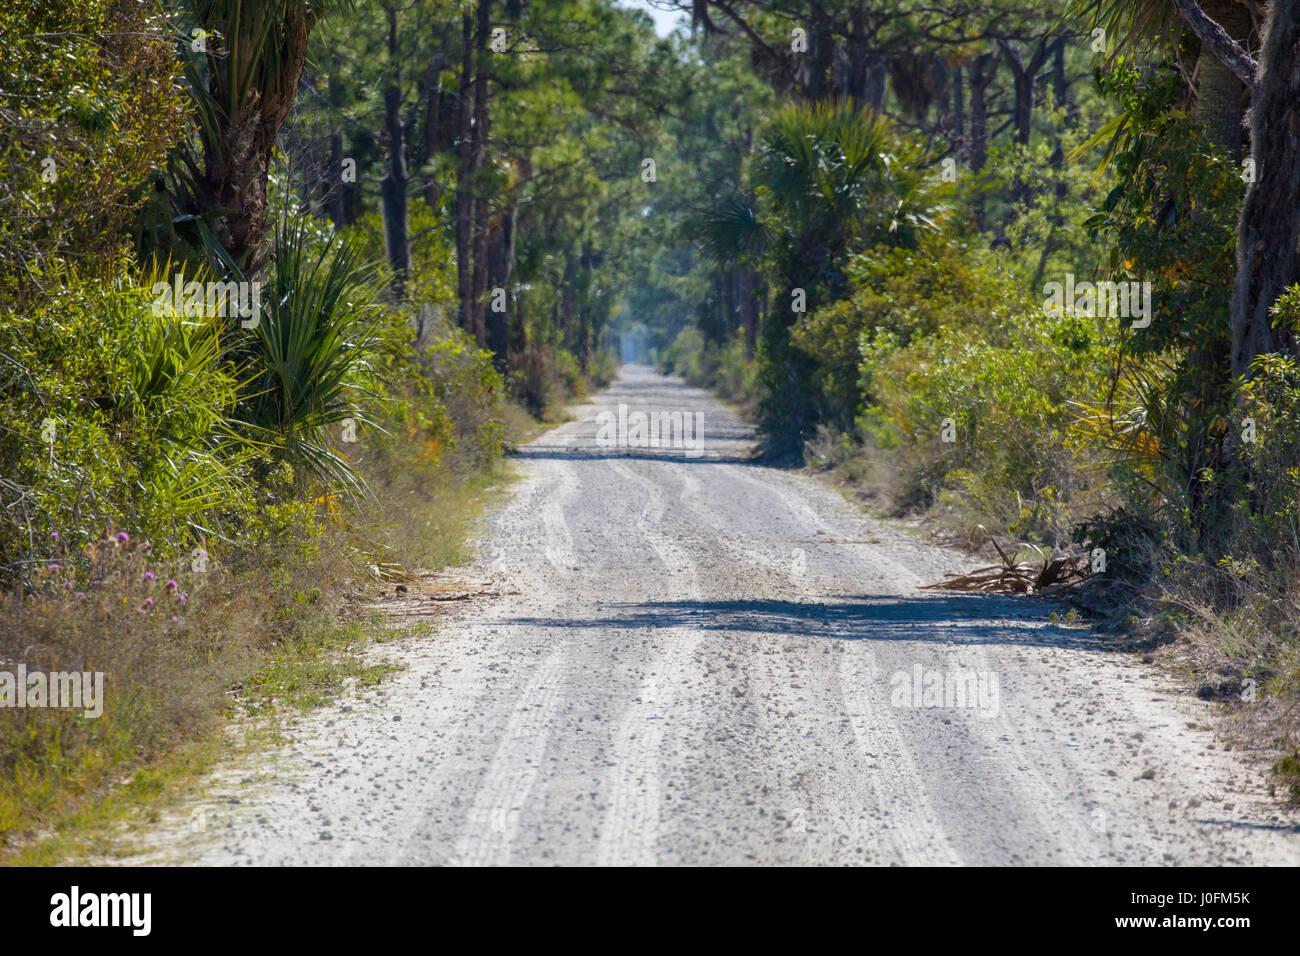 Road in Babcock/Webb Wildlife Management Area in Punta Gorda in Southwest Florida - Stock Image